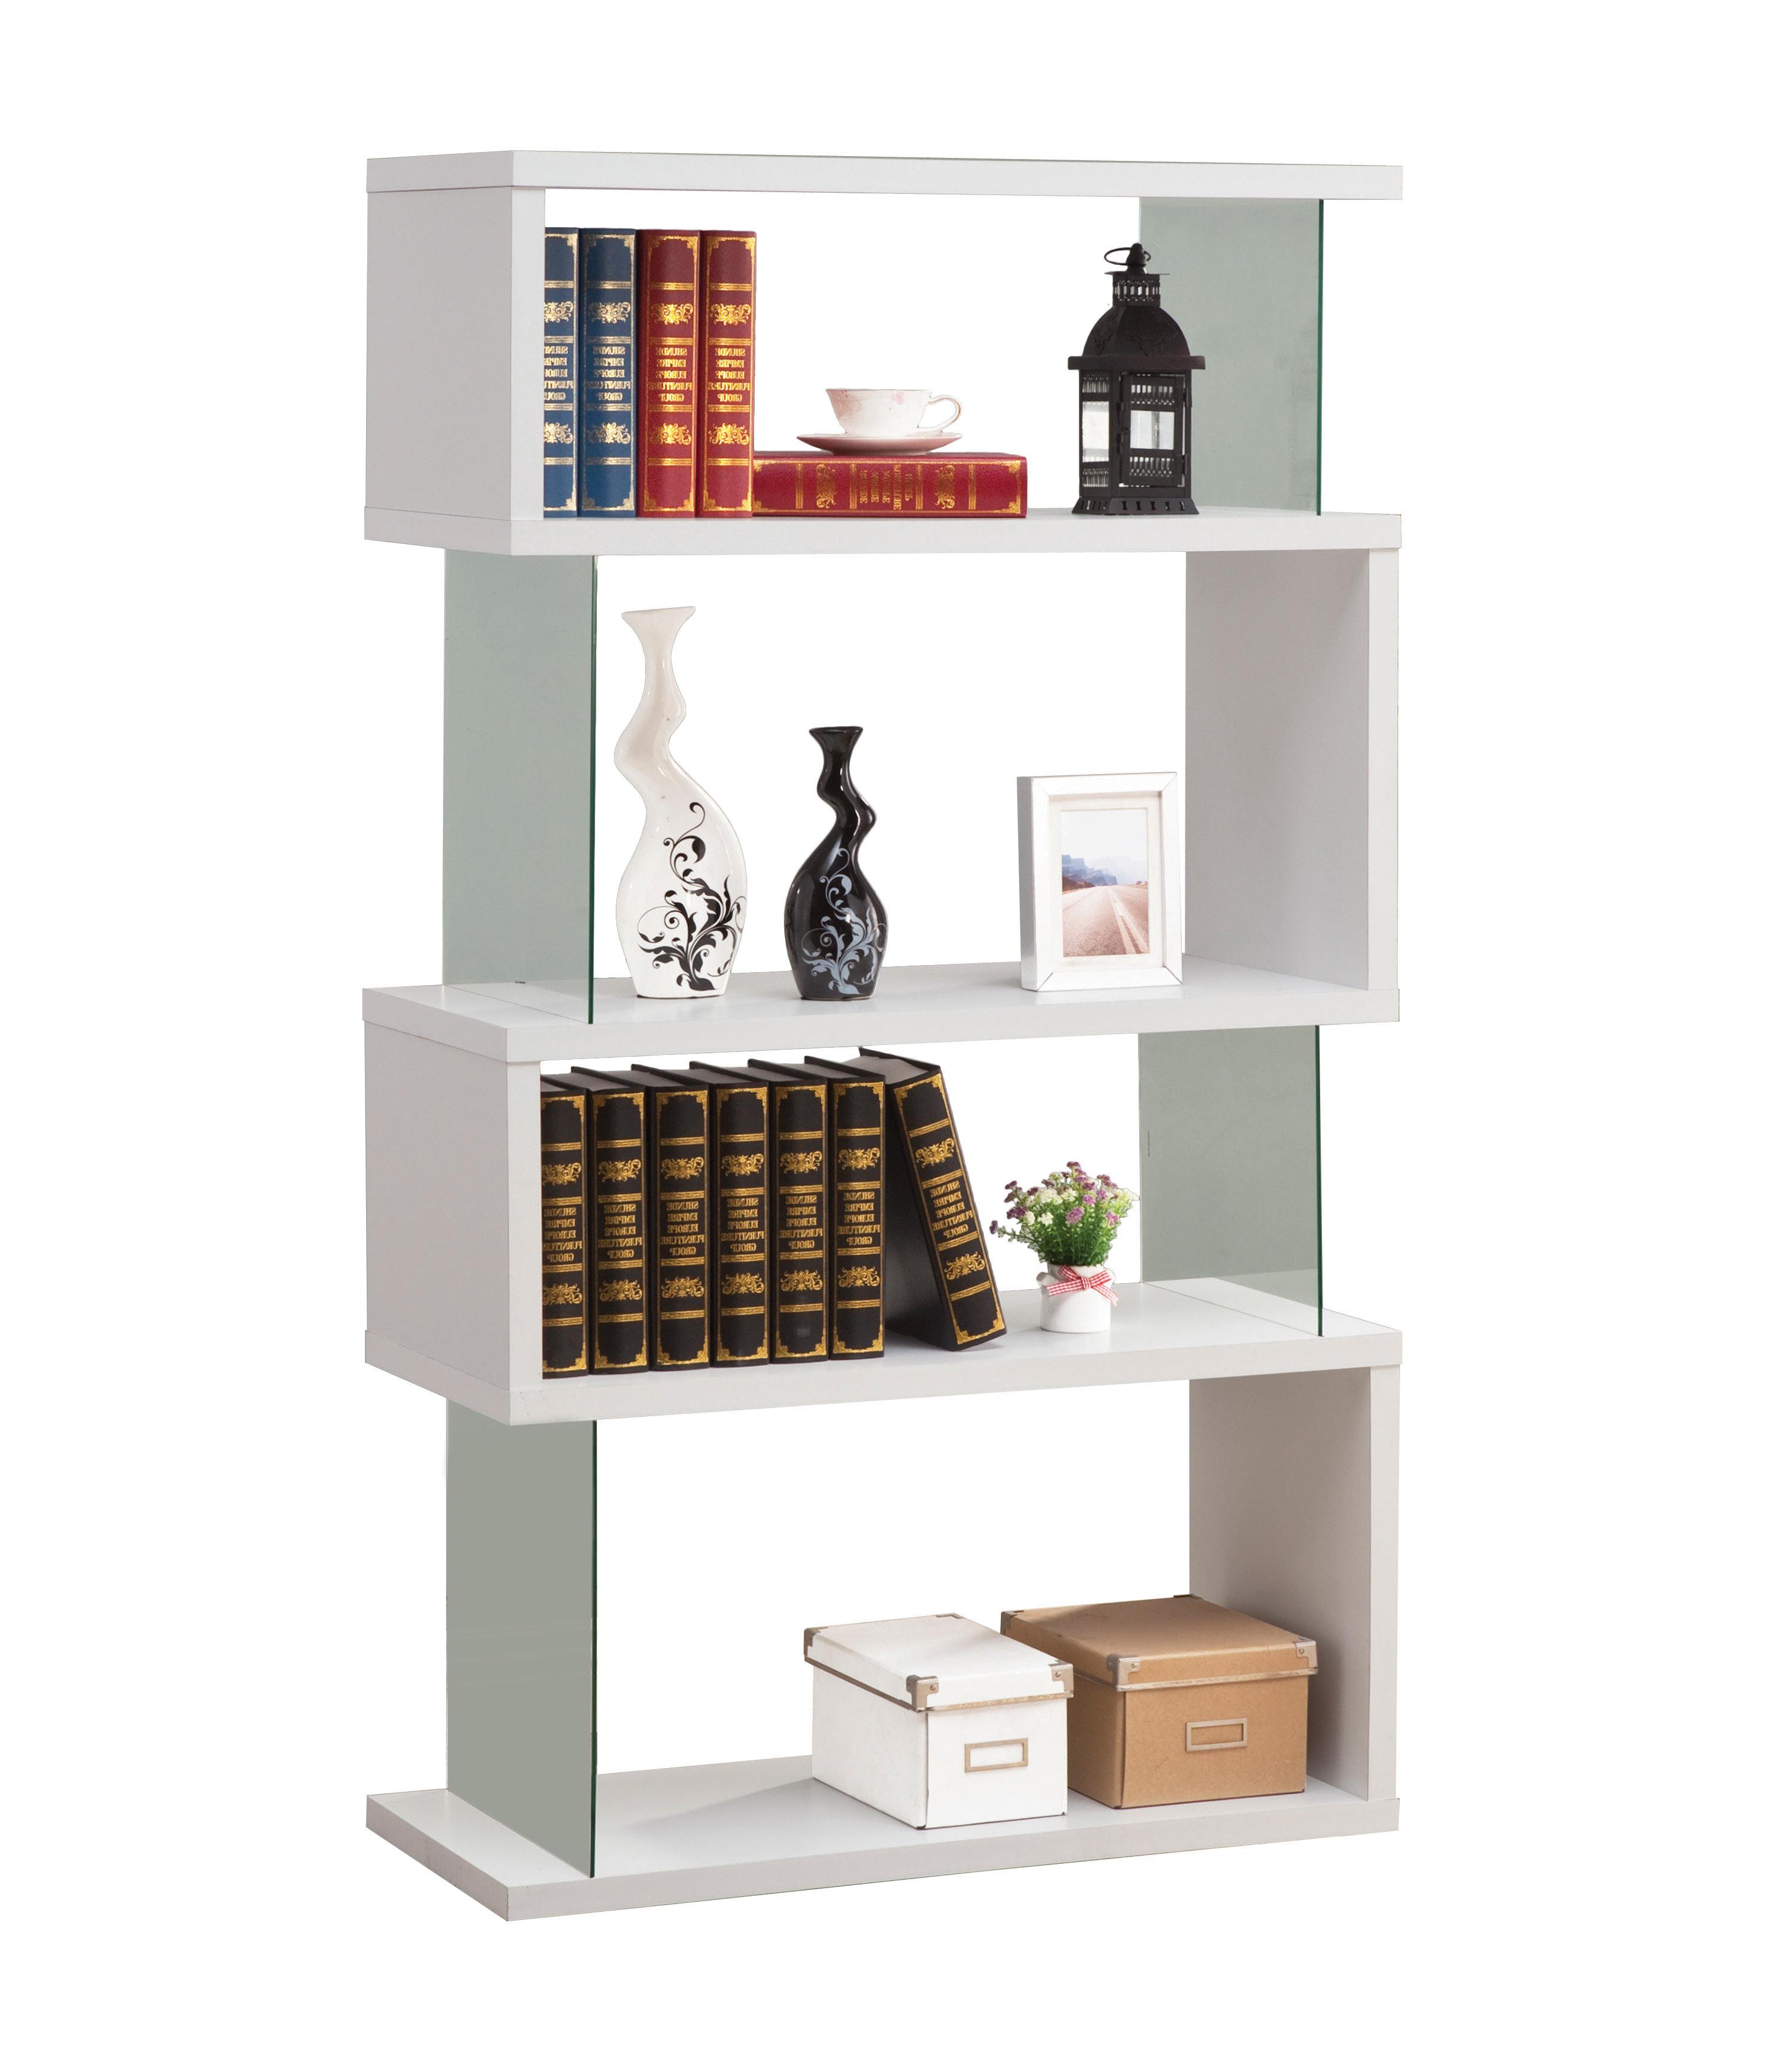 Widely Used Brayden Studio Ignacio Standard Bookcase With Ignacio Standard Bookcases (View 19 of 20)